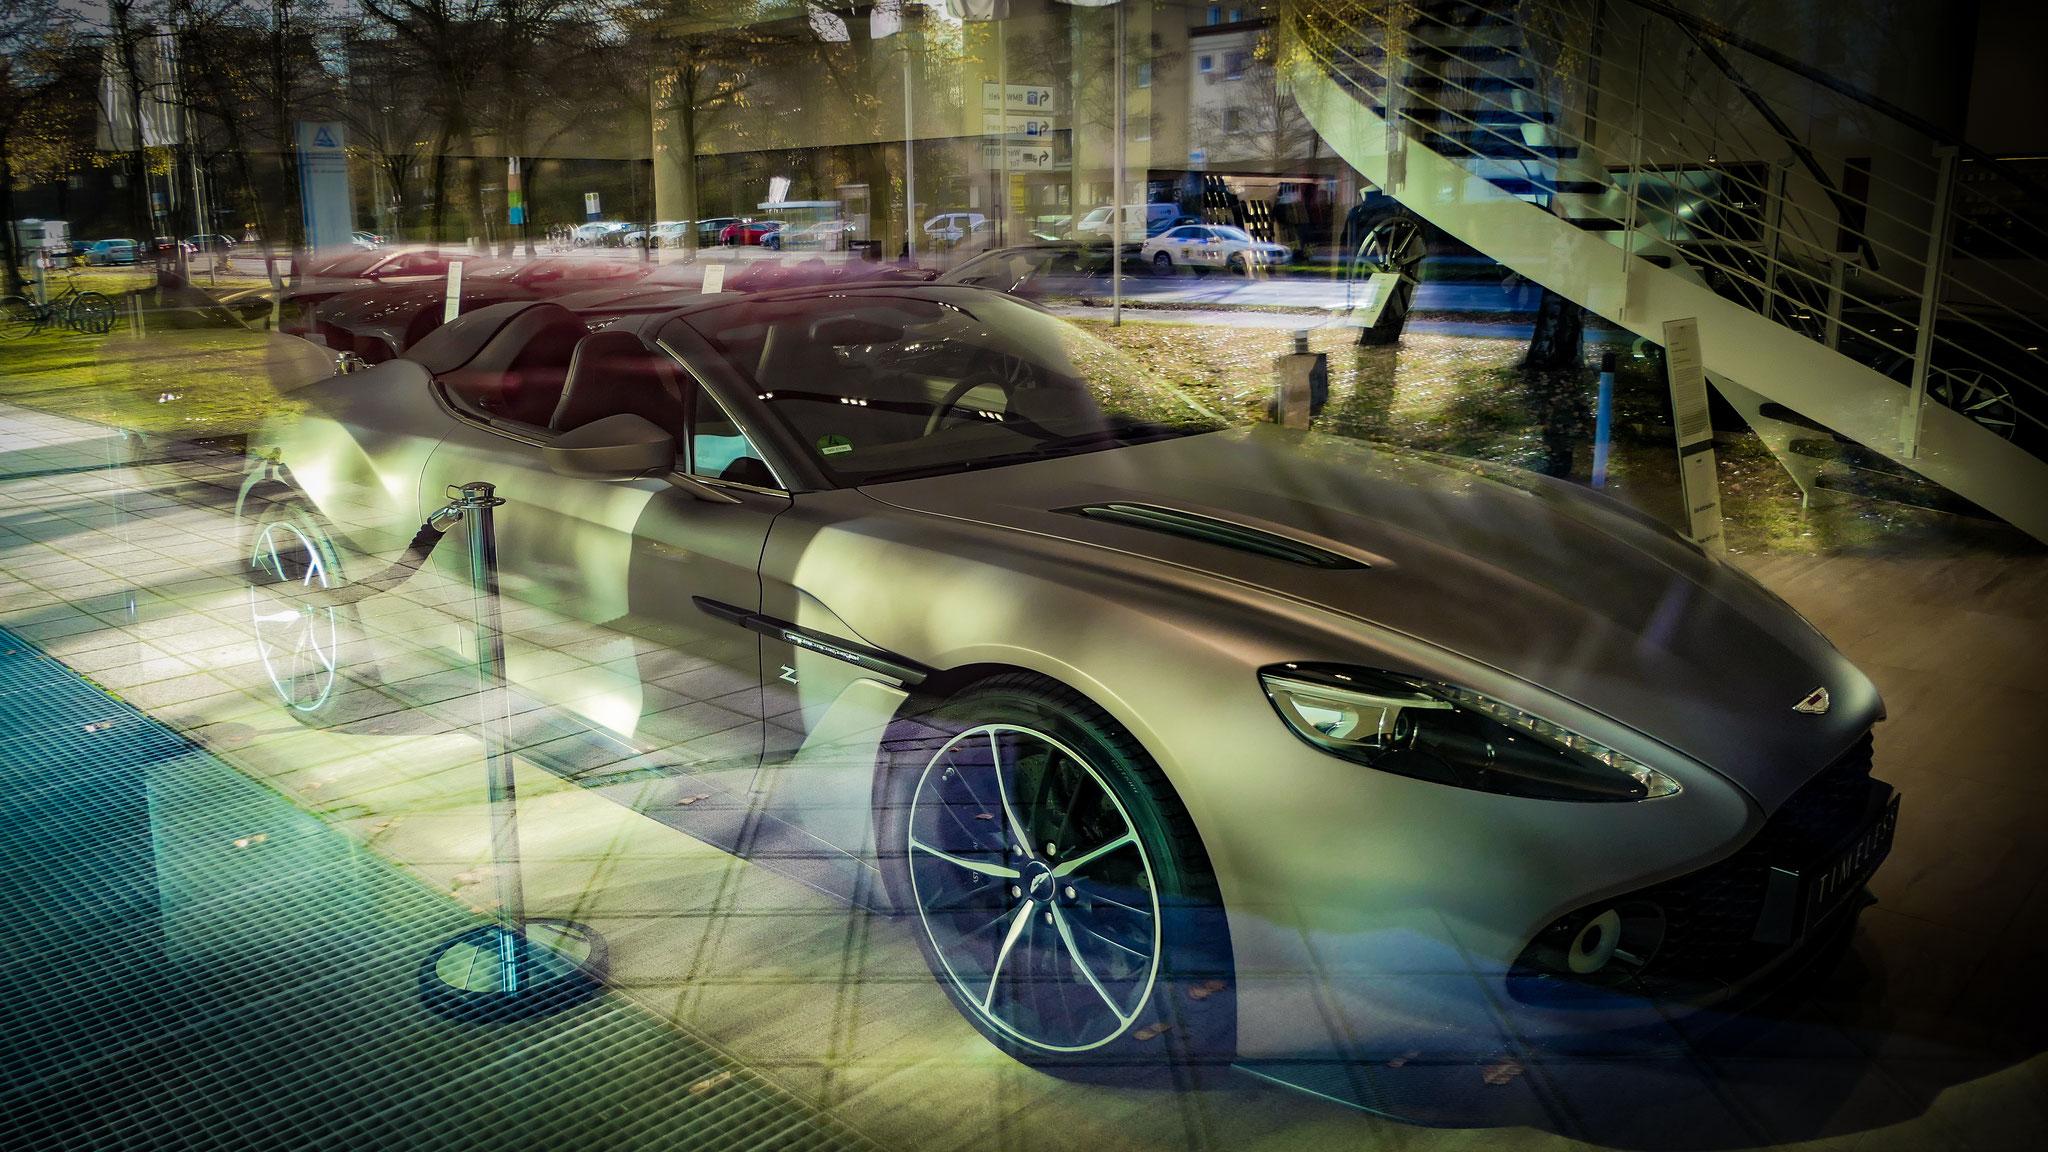 Aston Martin Vanquish Zagato Speedster - MB-EV-88 (1 of 28)